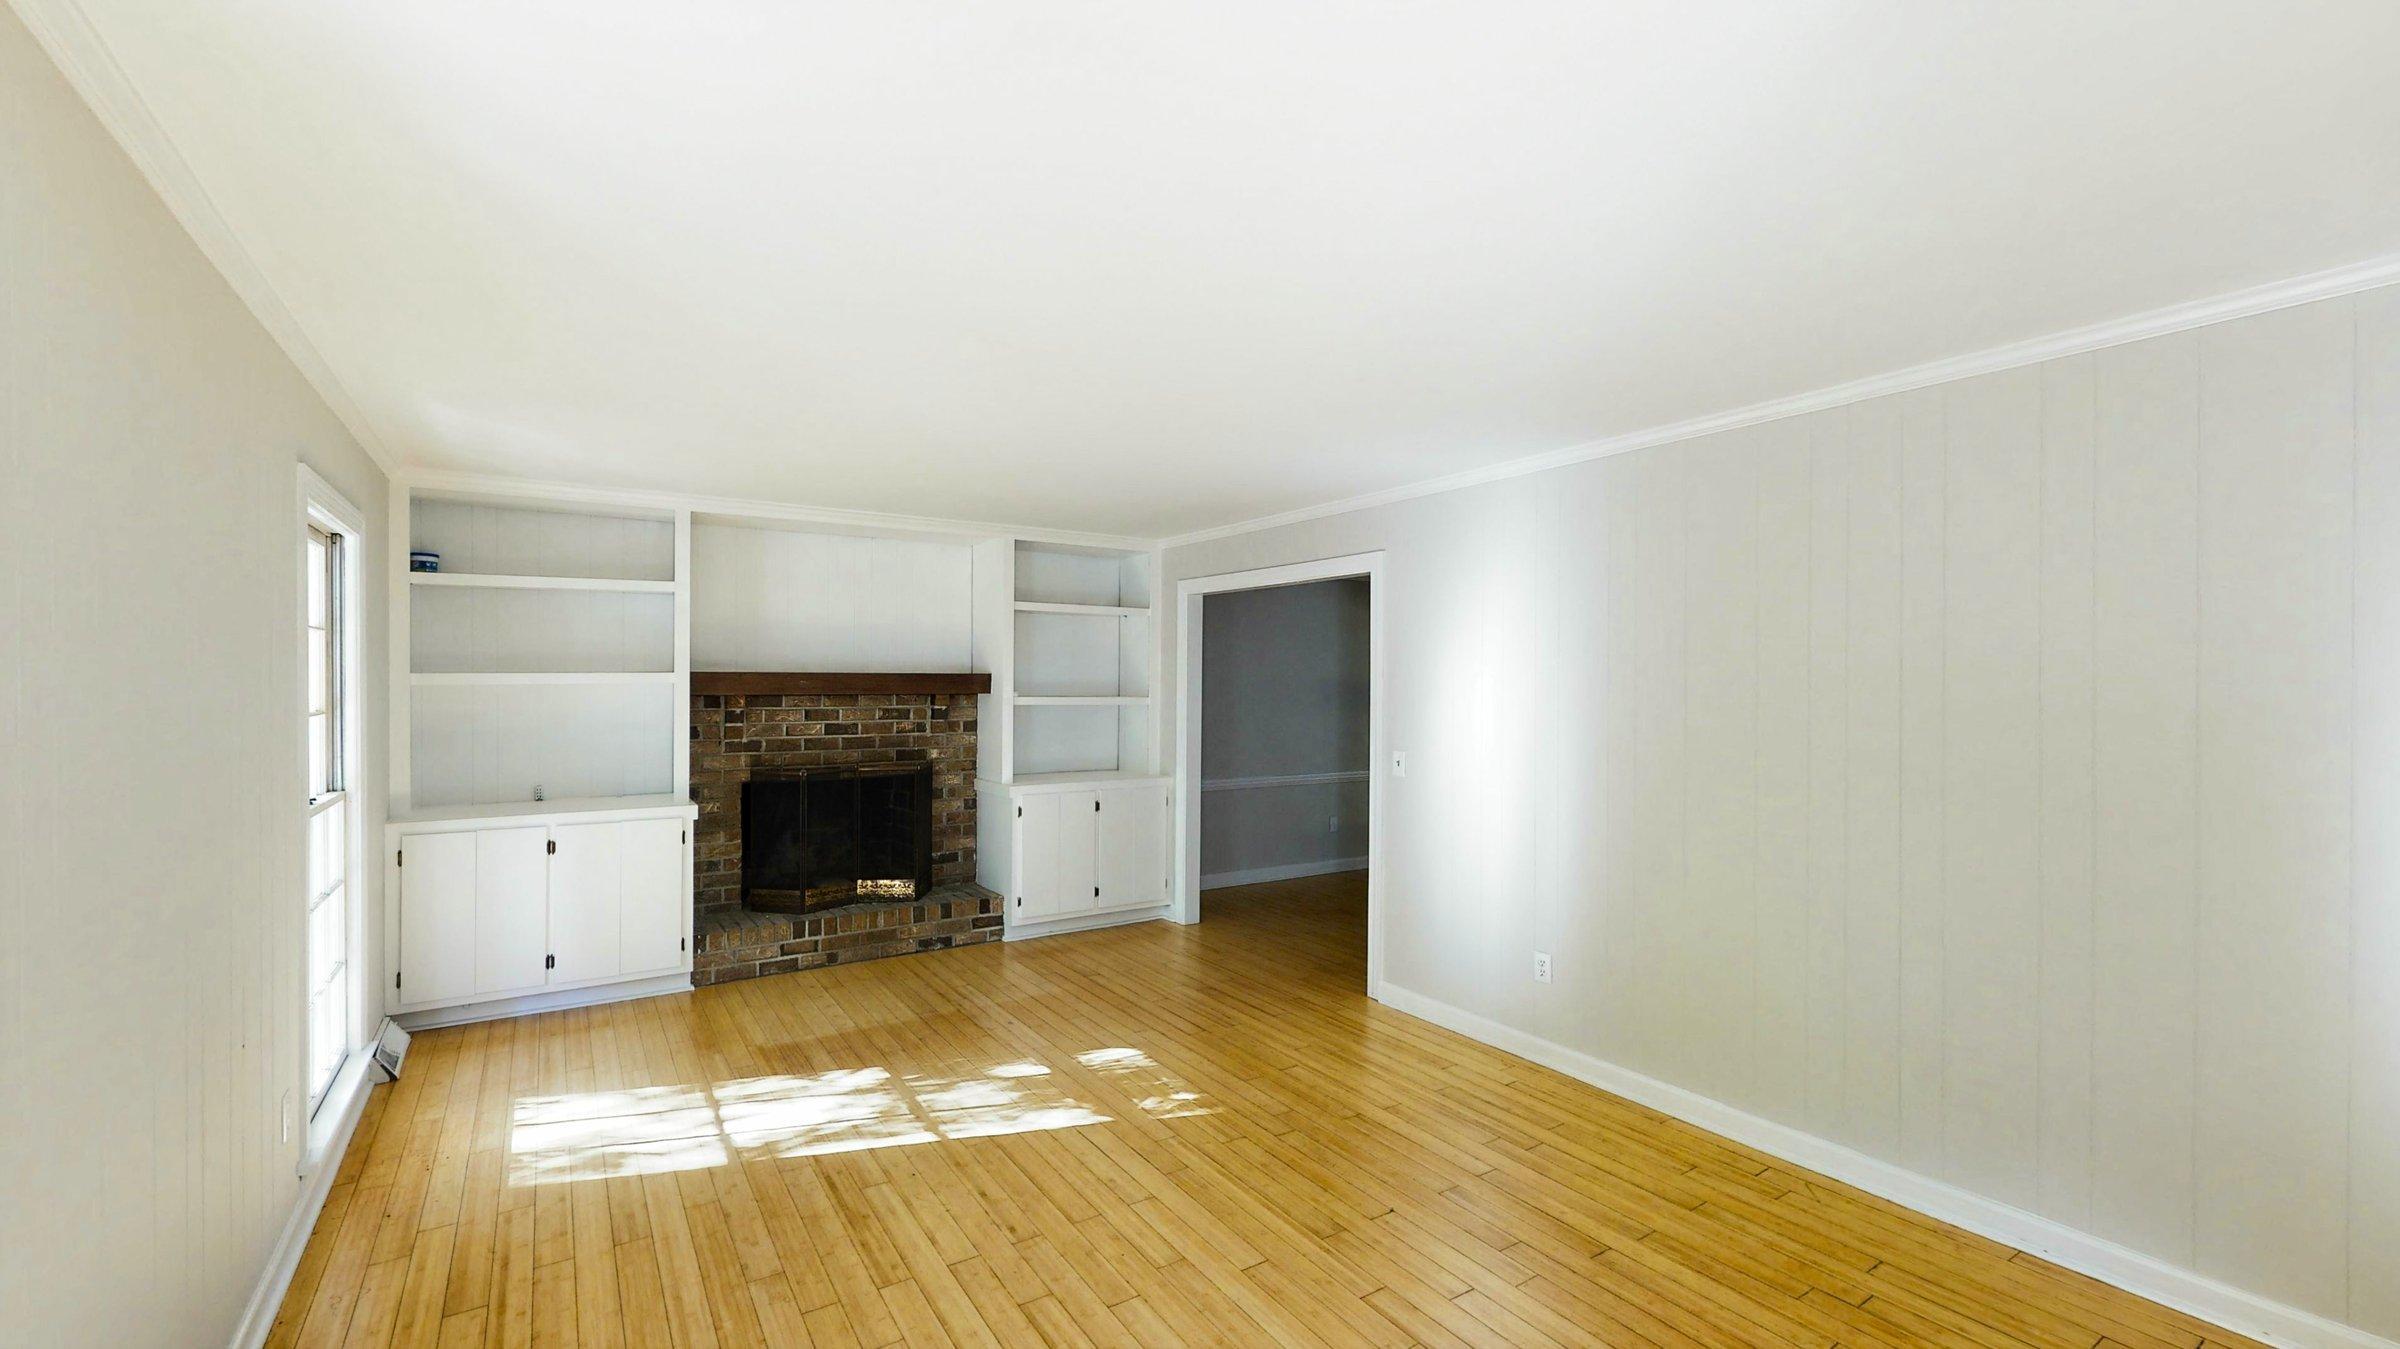 Snee Farm Homes For Sale - 1168 Parkway, Mount Pleasant, SC - 2